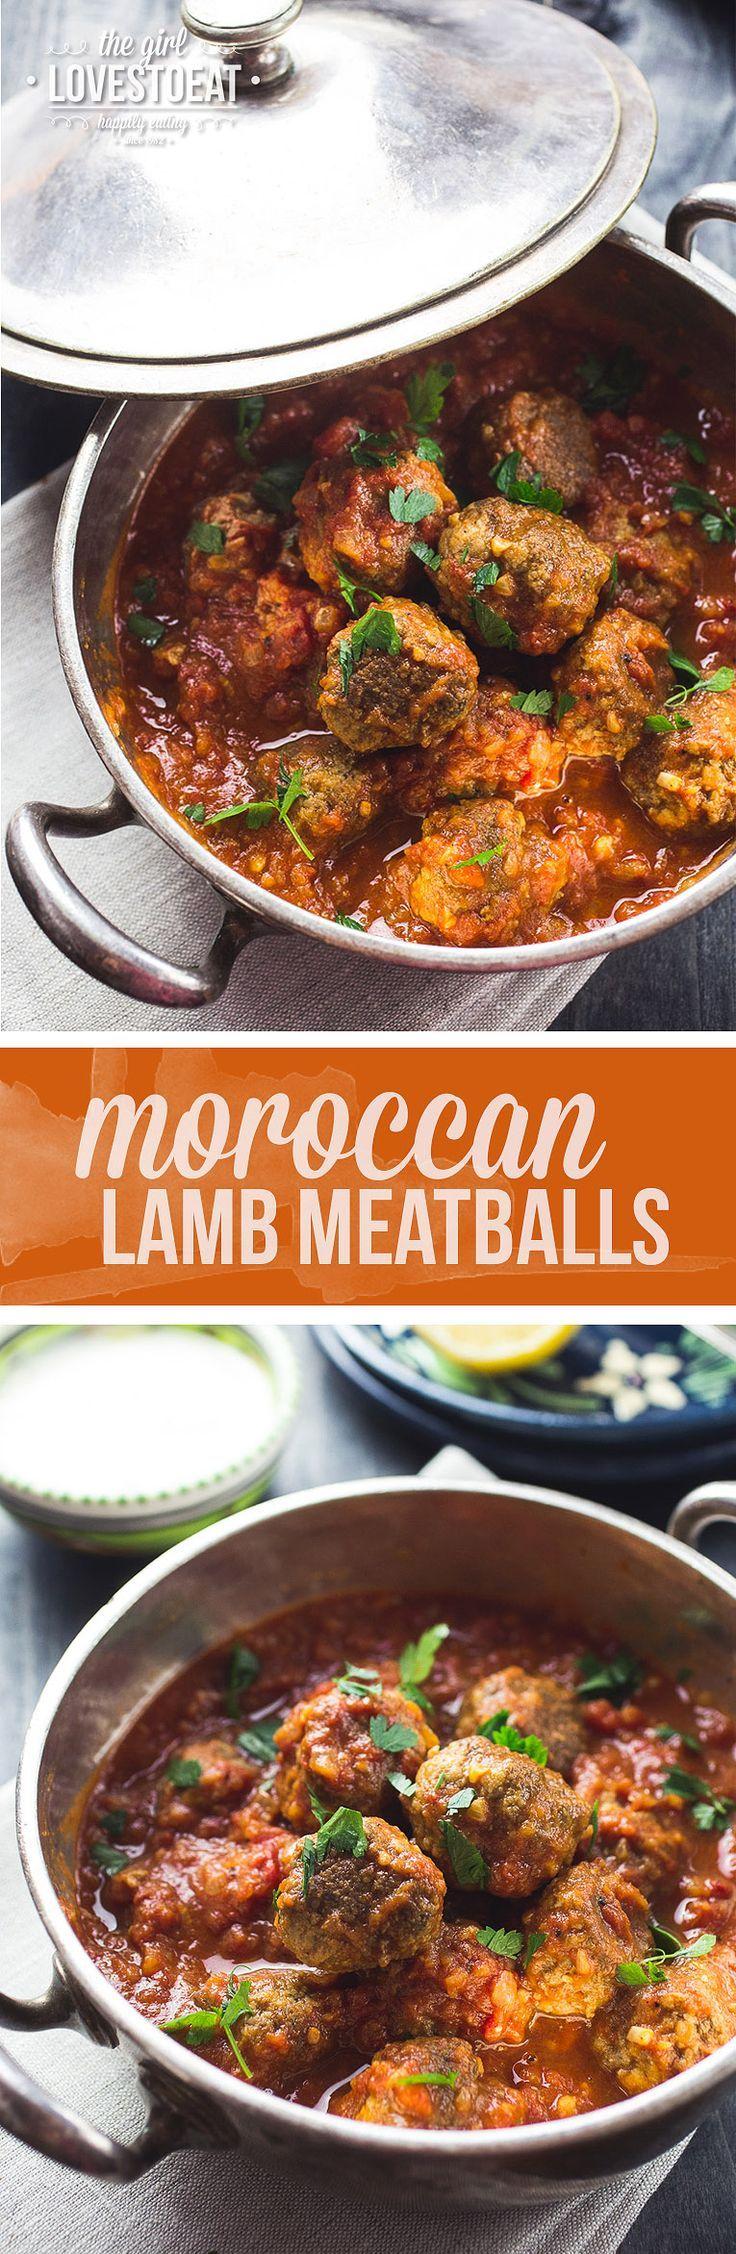 Moroccan Lamb Meatballs { http://thegirllovestoeat.com }